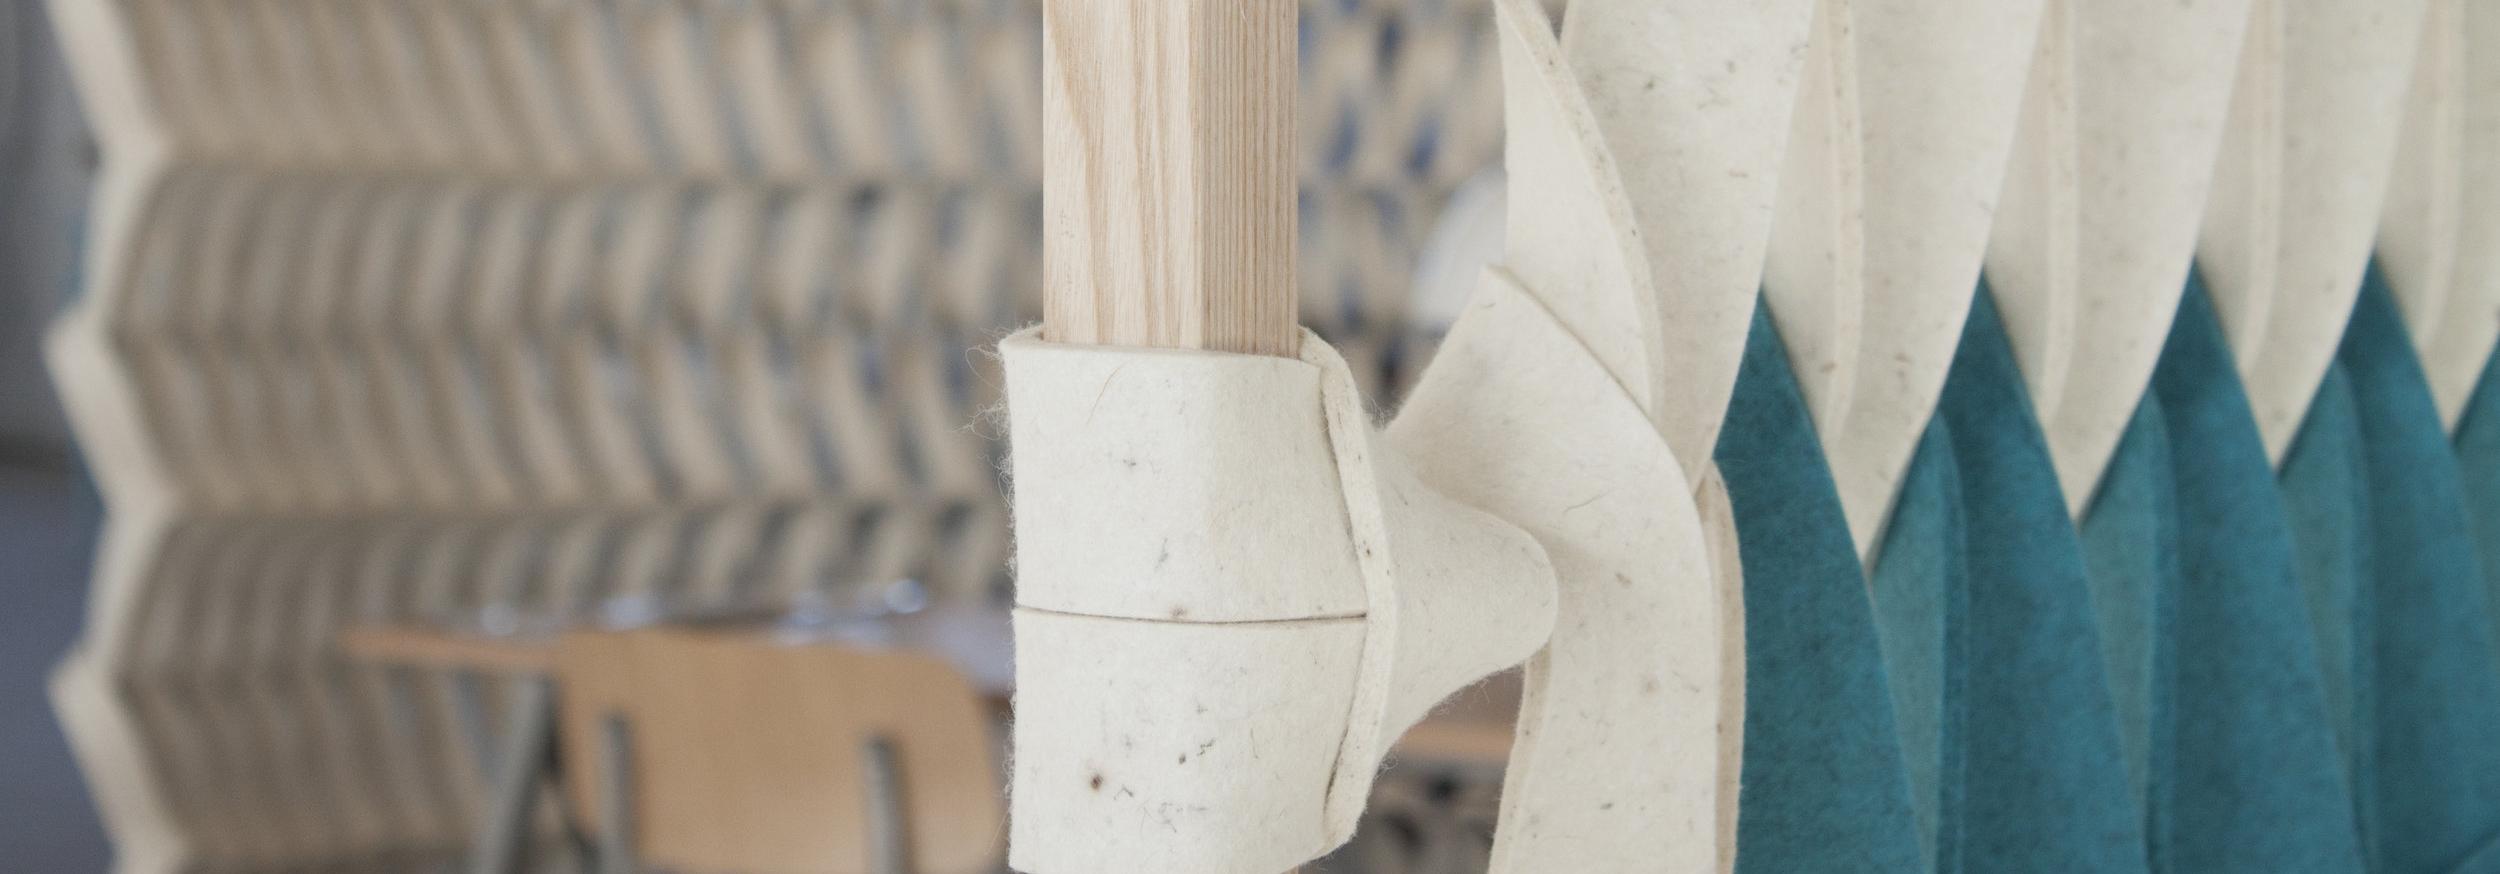 StudioPetraVonk PLECTERE acoustic improving textile design detail frame petrol.jpg